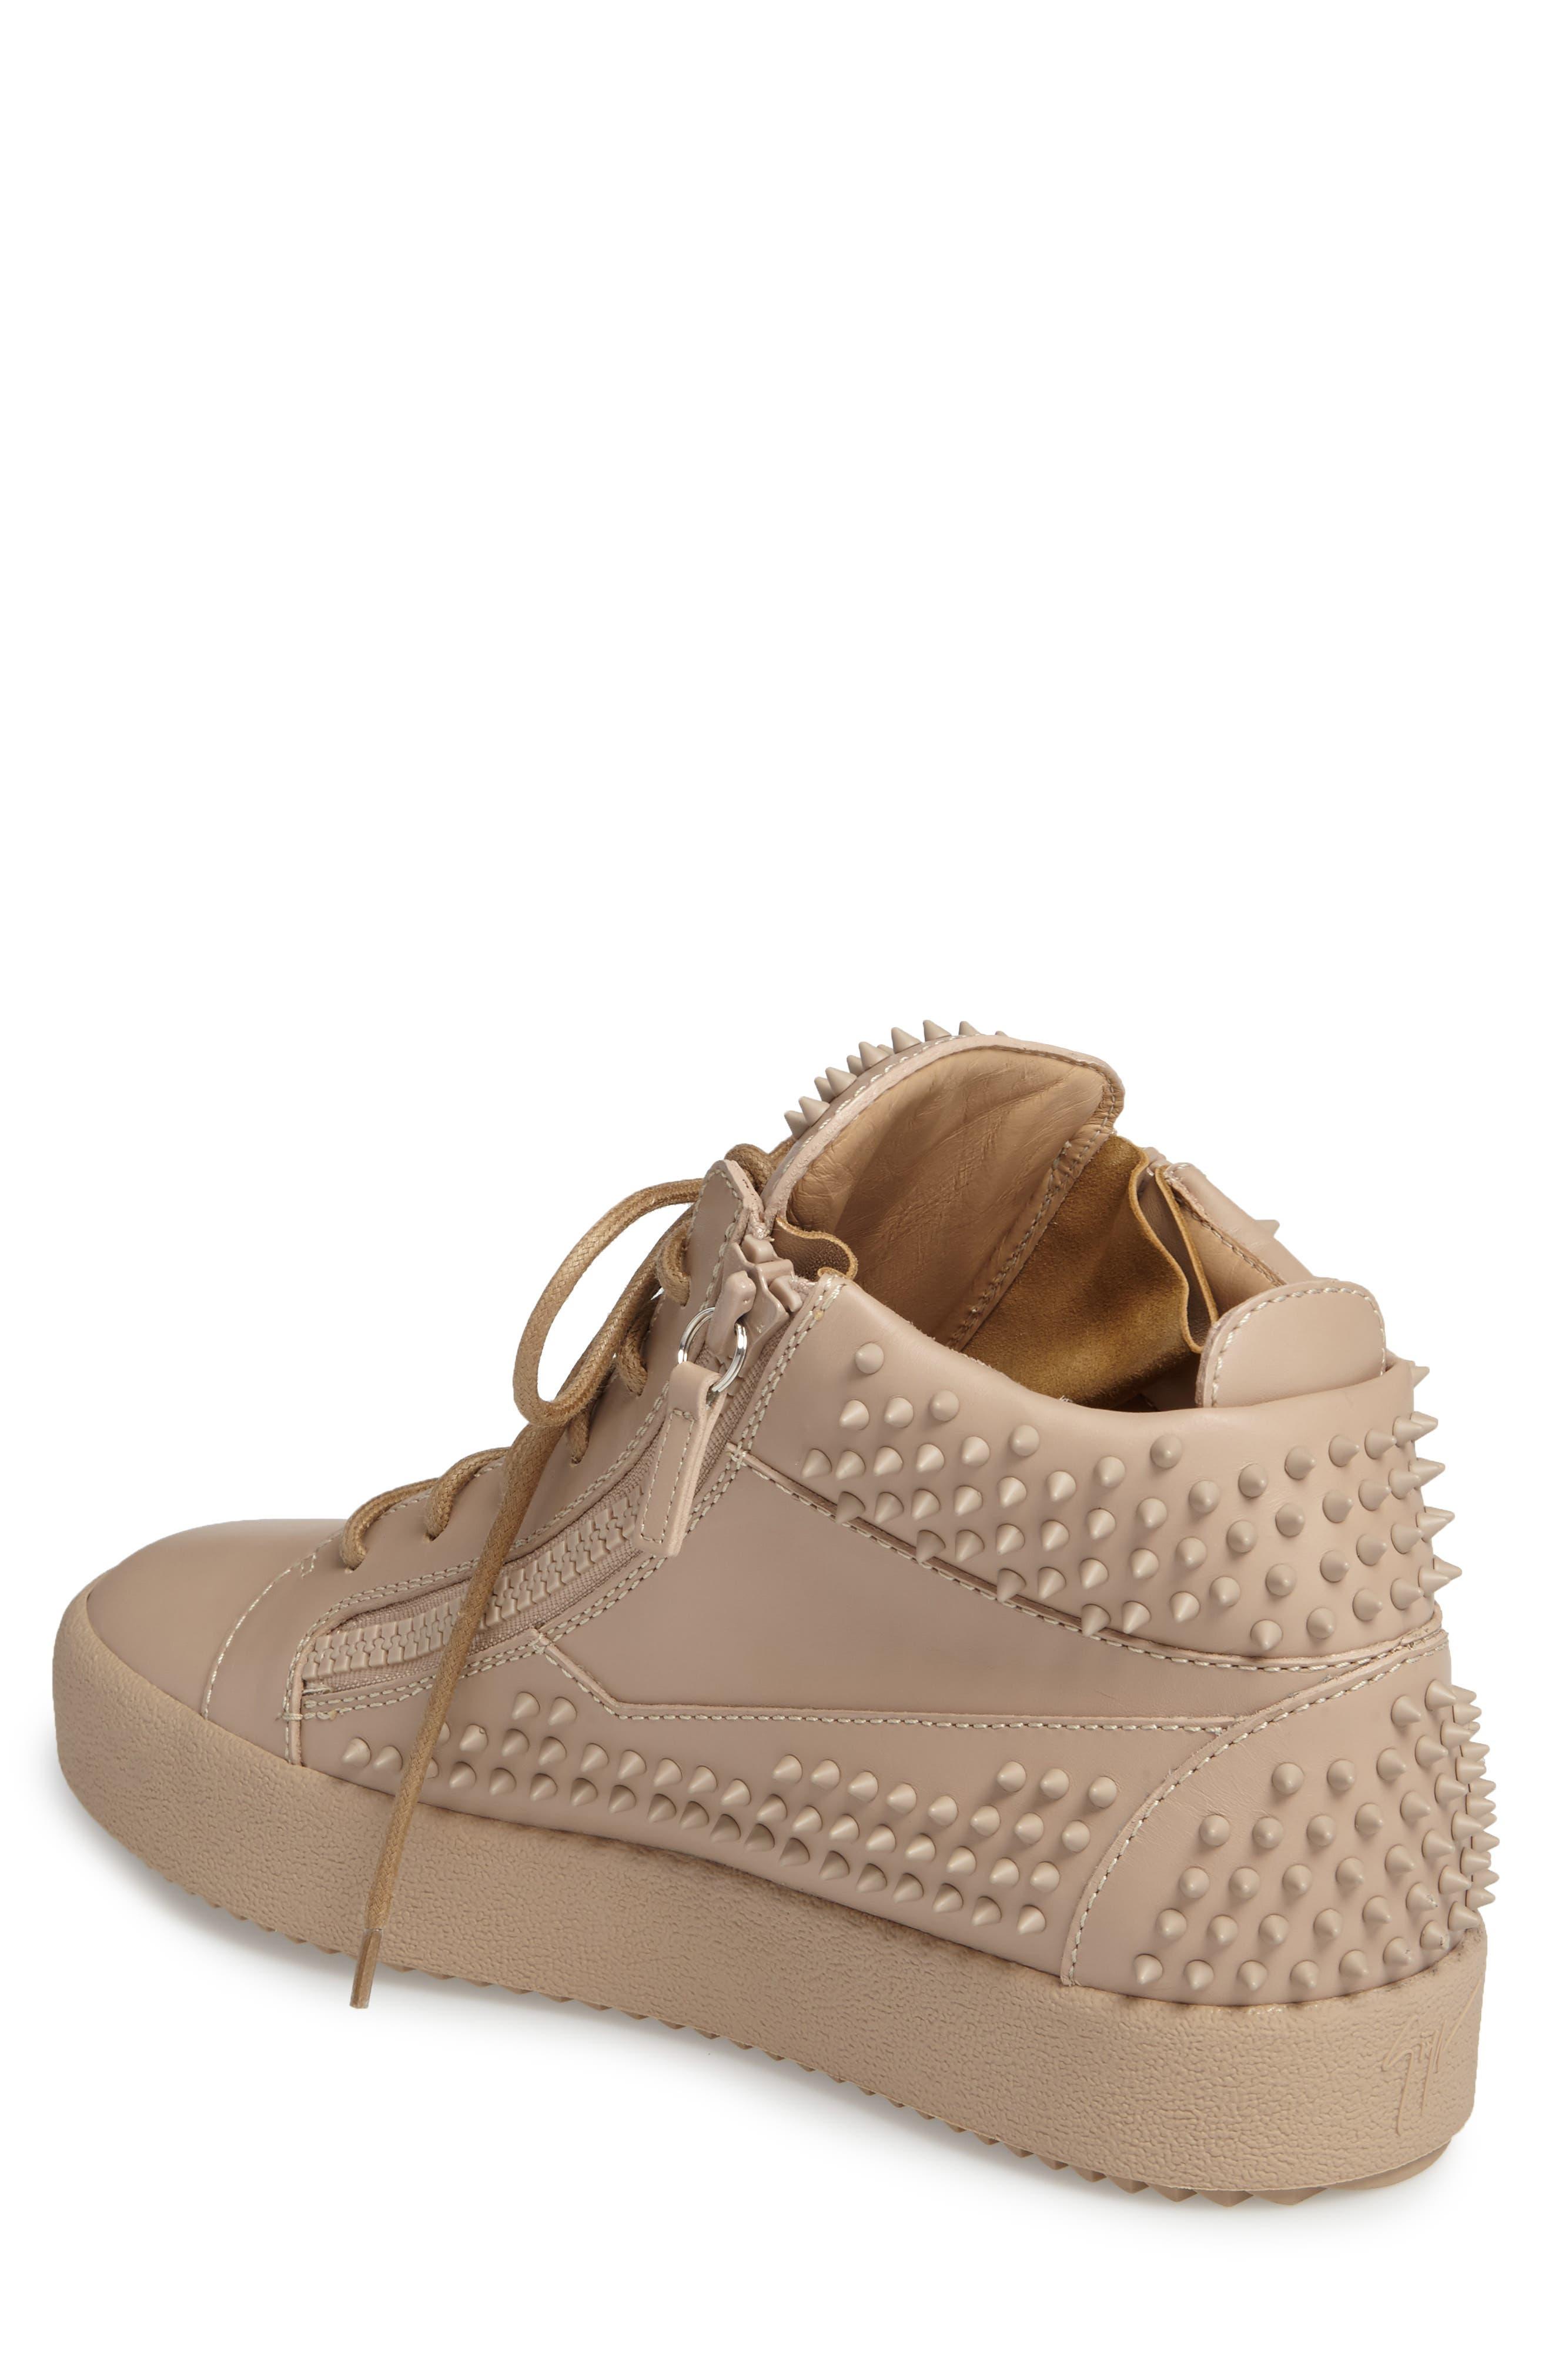 Studded Mid Top Sneaker,                             Alternate thumbnail 2, color,                             Tan/ Birel Sughero